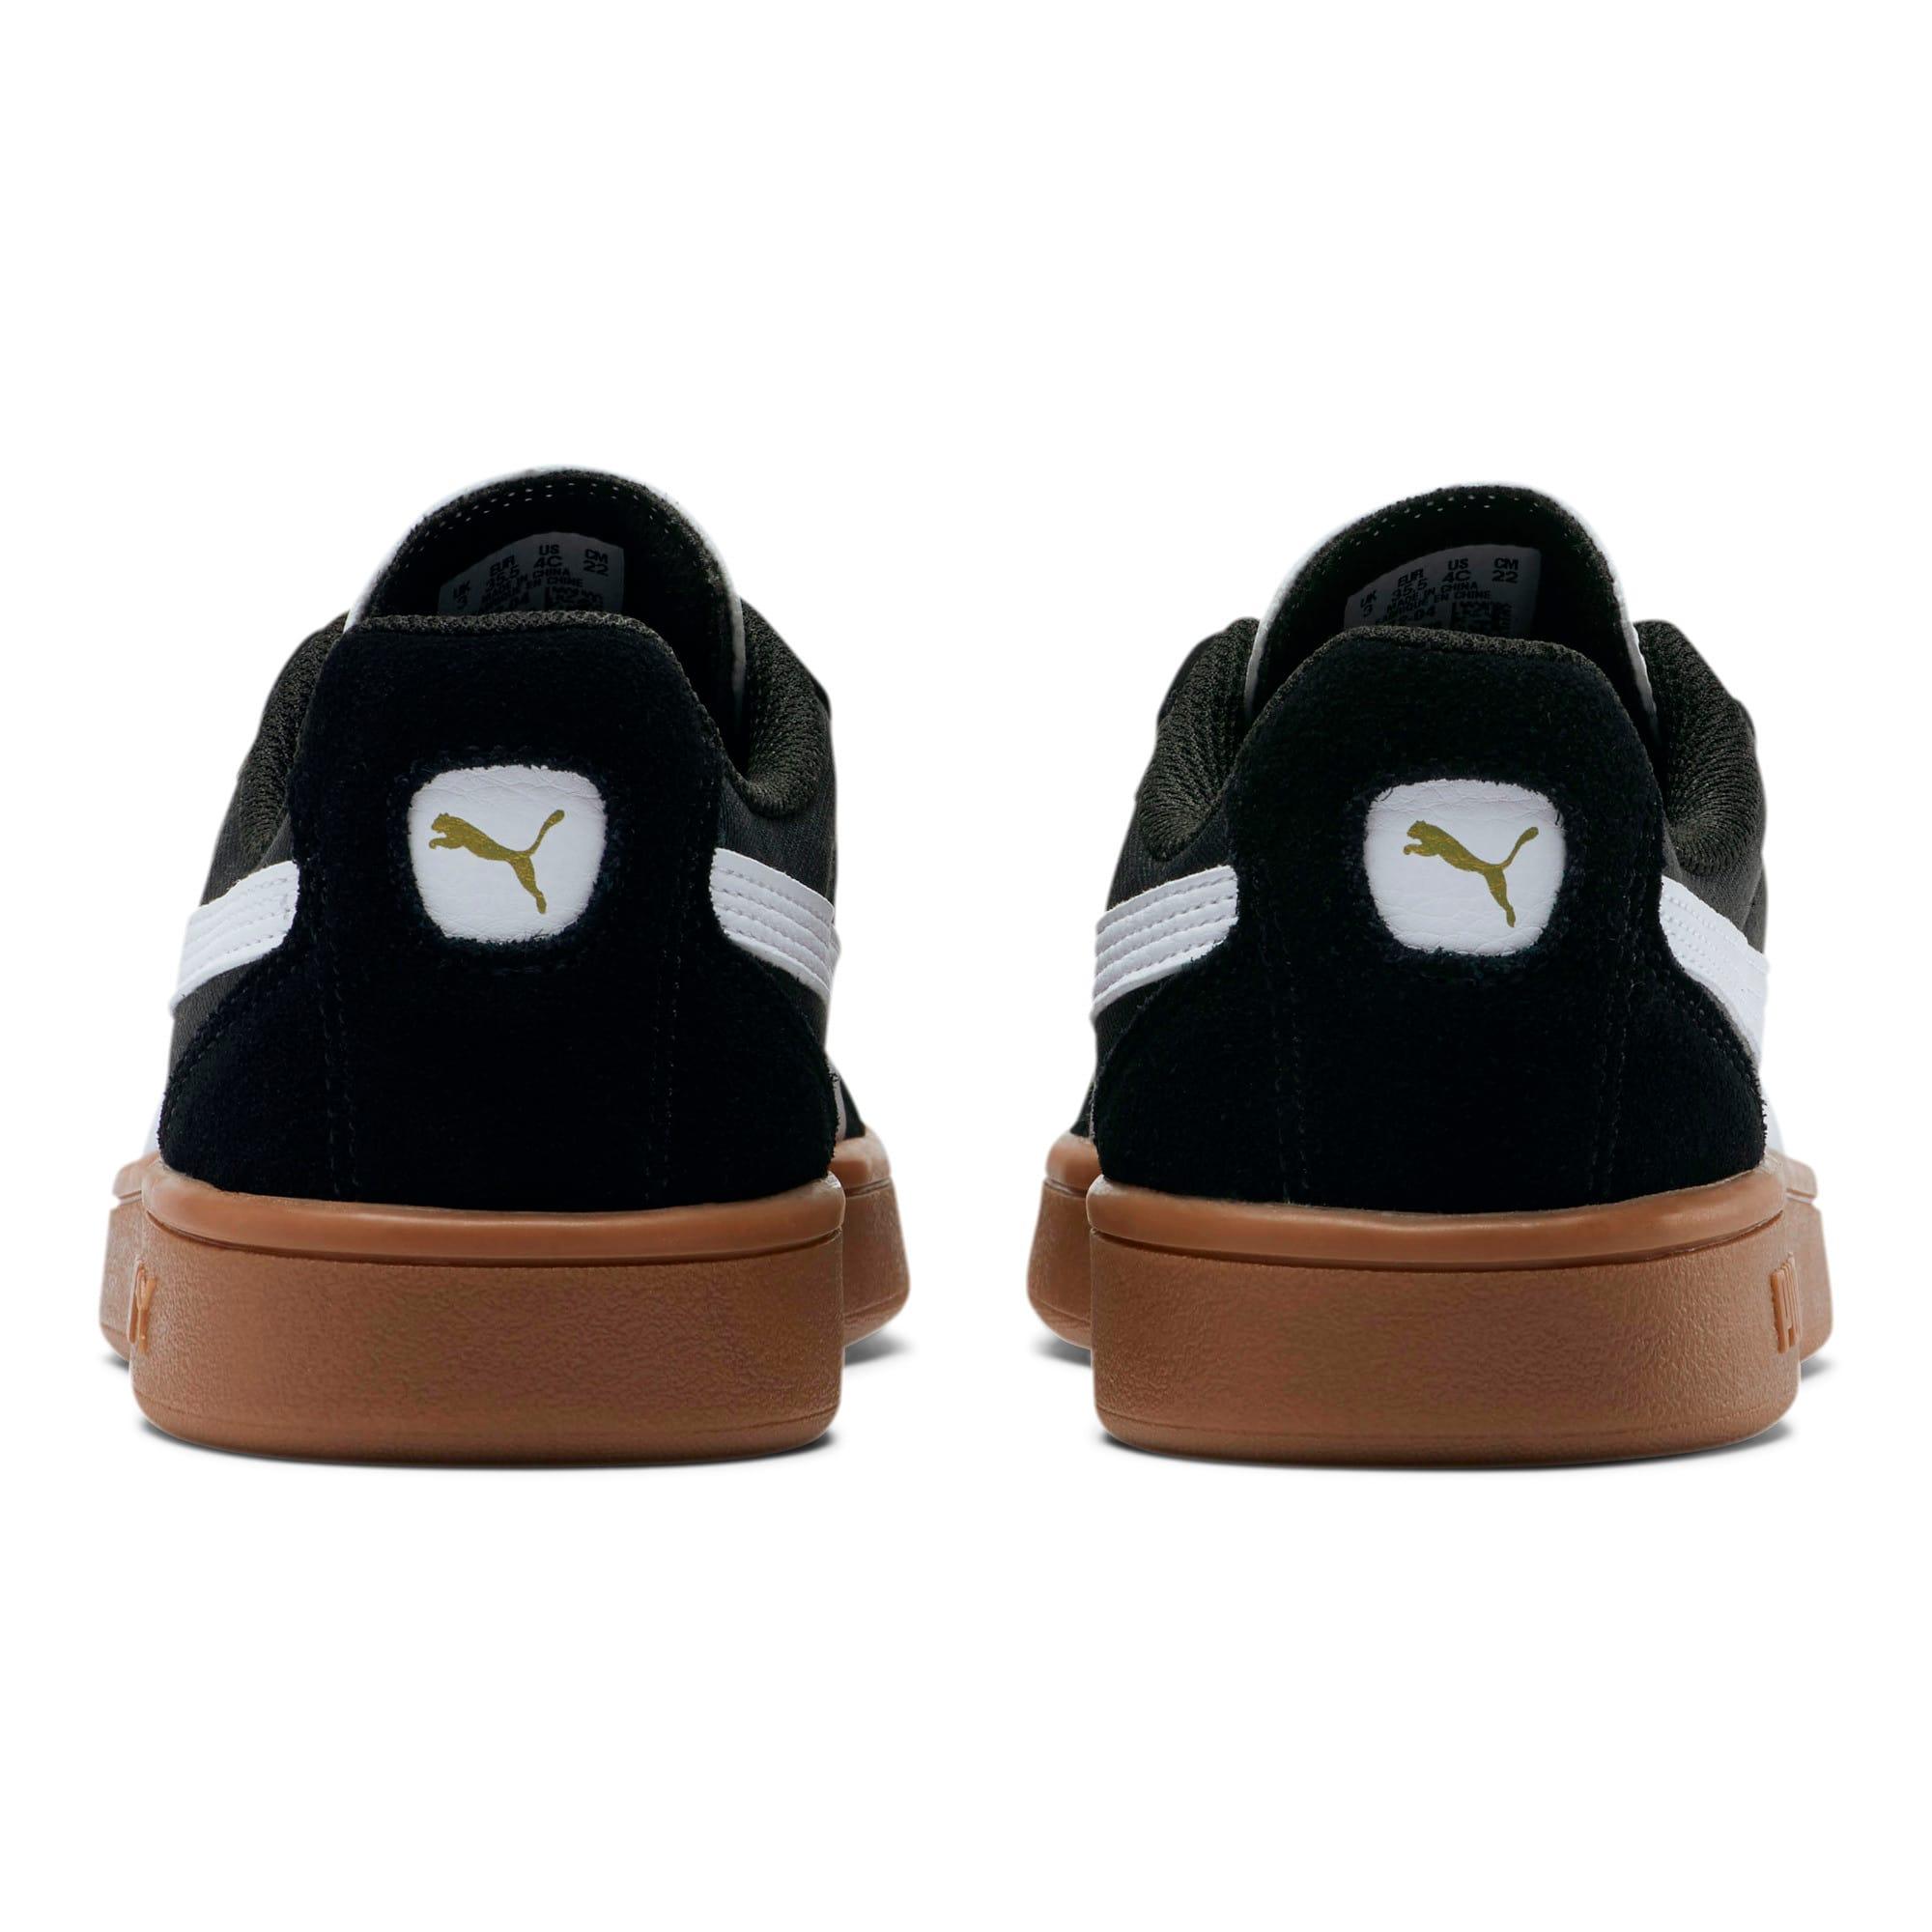 Thumbnail 3 of Astro Kick Sneakers JR, Puma Black-Puma White-Gold, medium